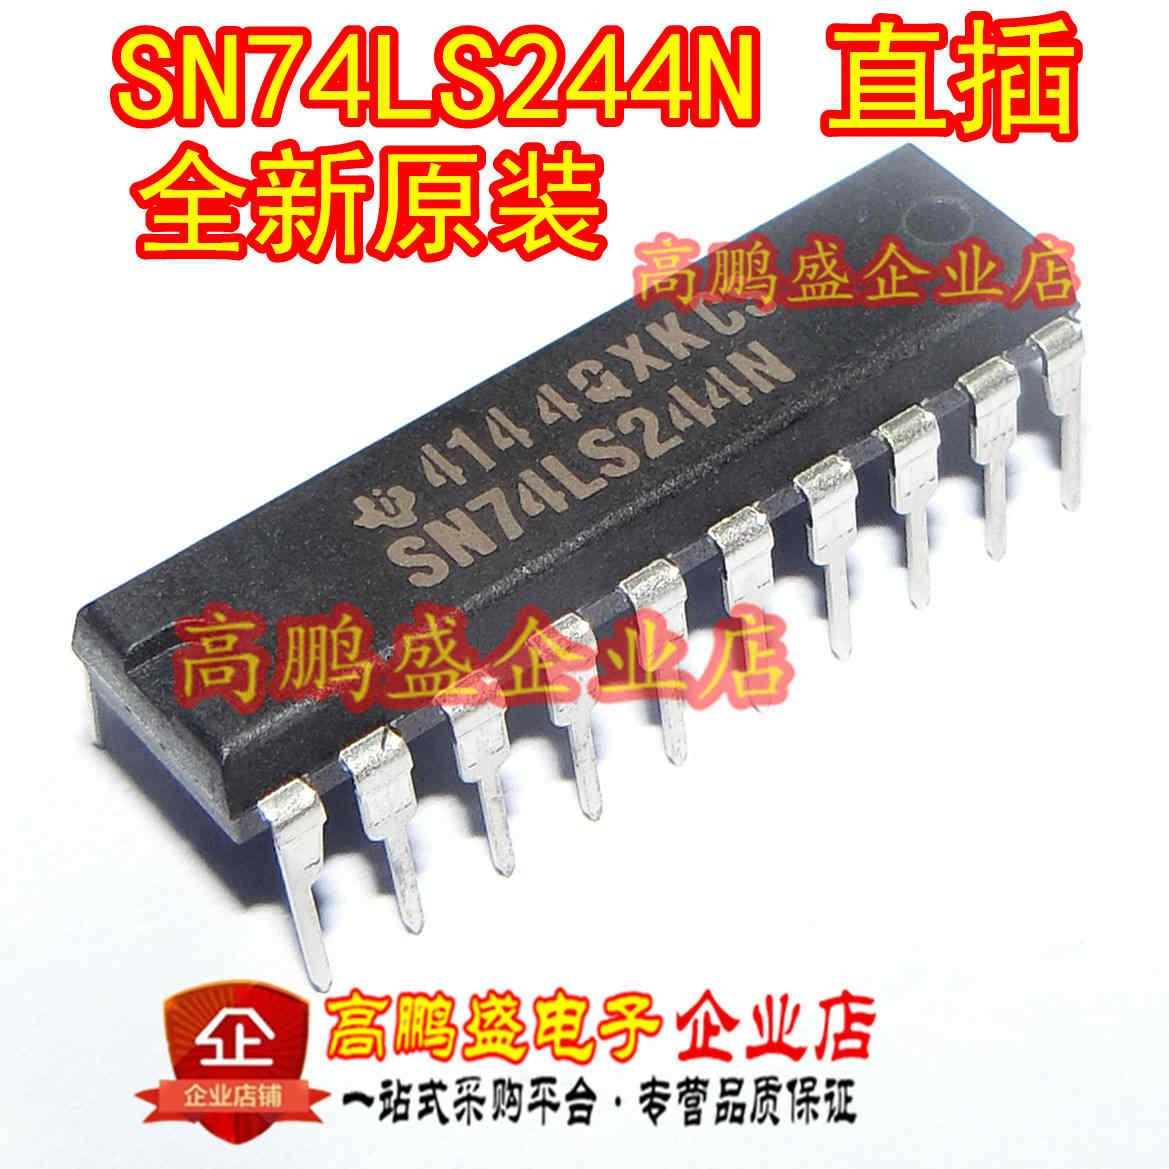 SN74HC573N SN74HC245N SN74HC244N SN74HC374N HST-2027DR H2001DG MM74HC540N SN74HCT373N S3F94C4EZZ-DK94 SN74LS244N